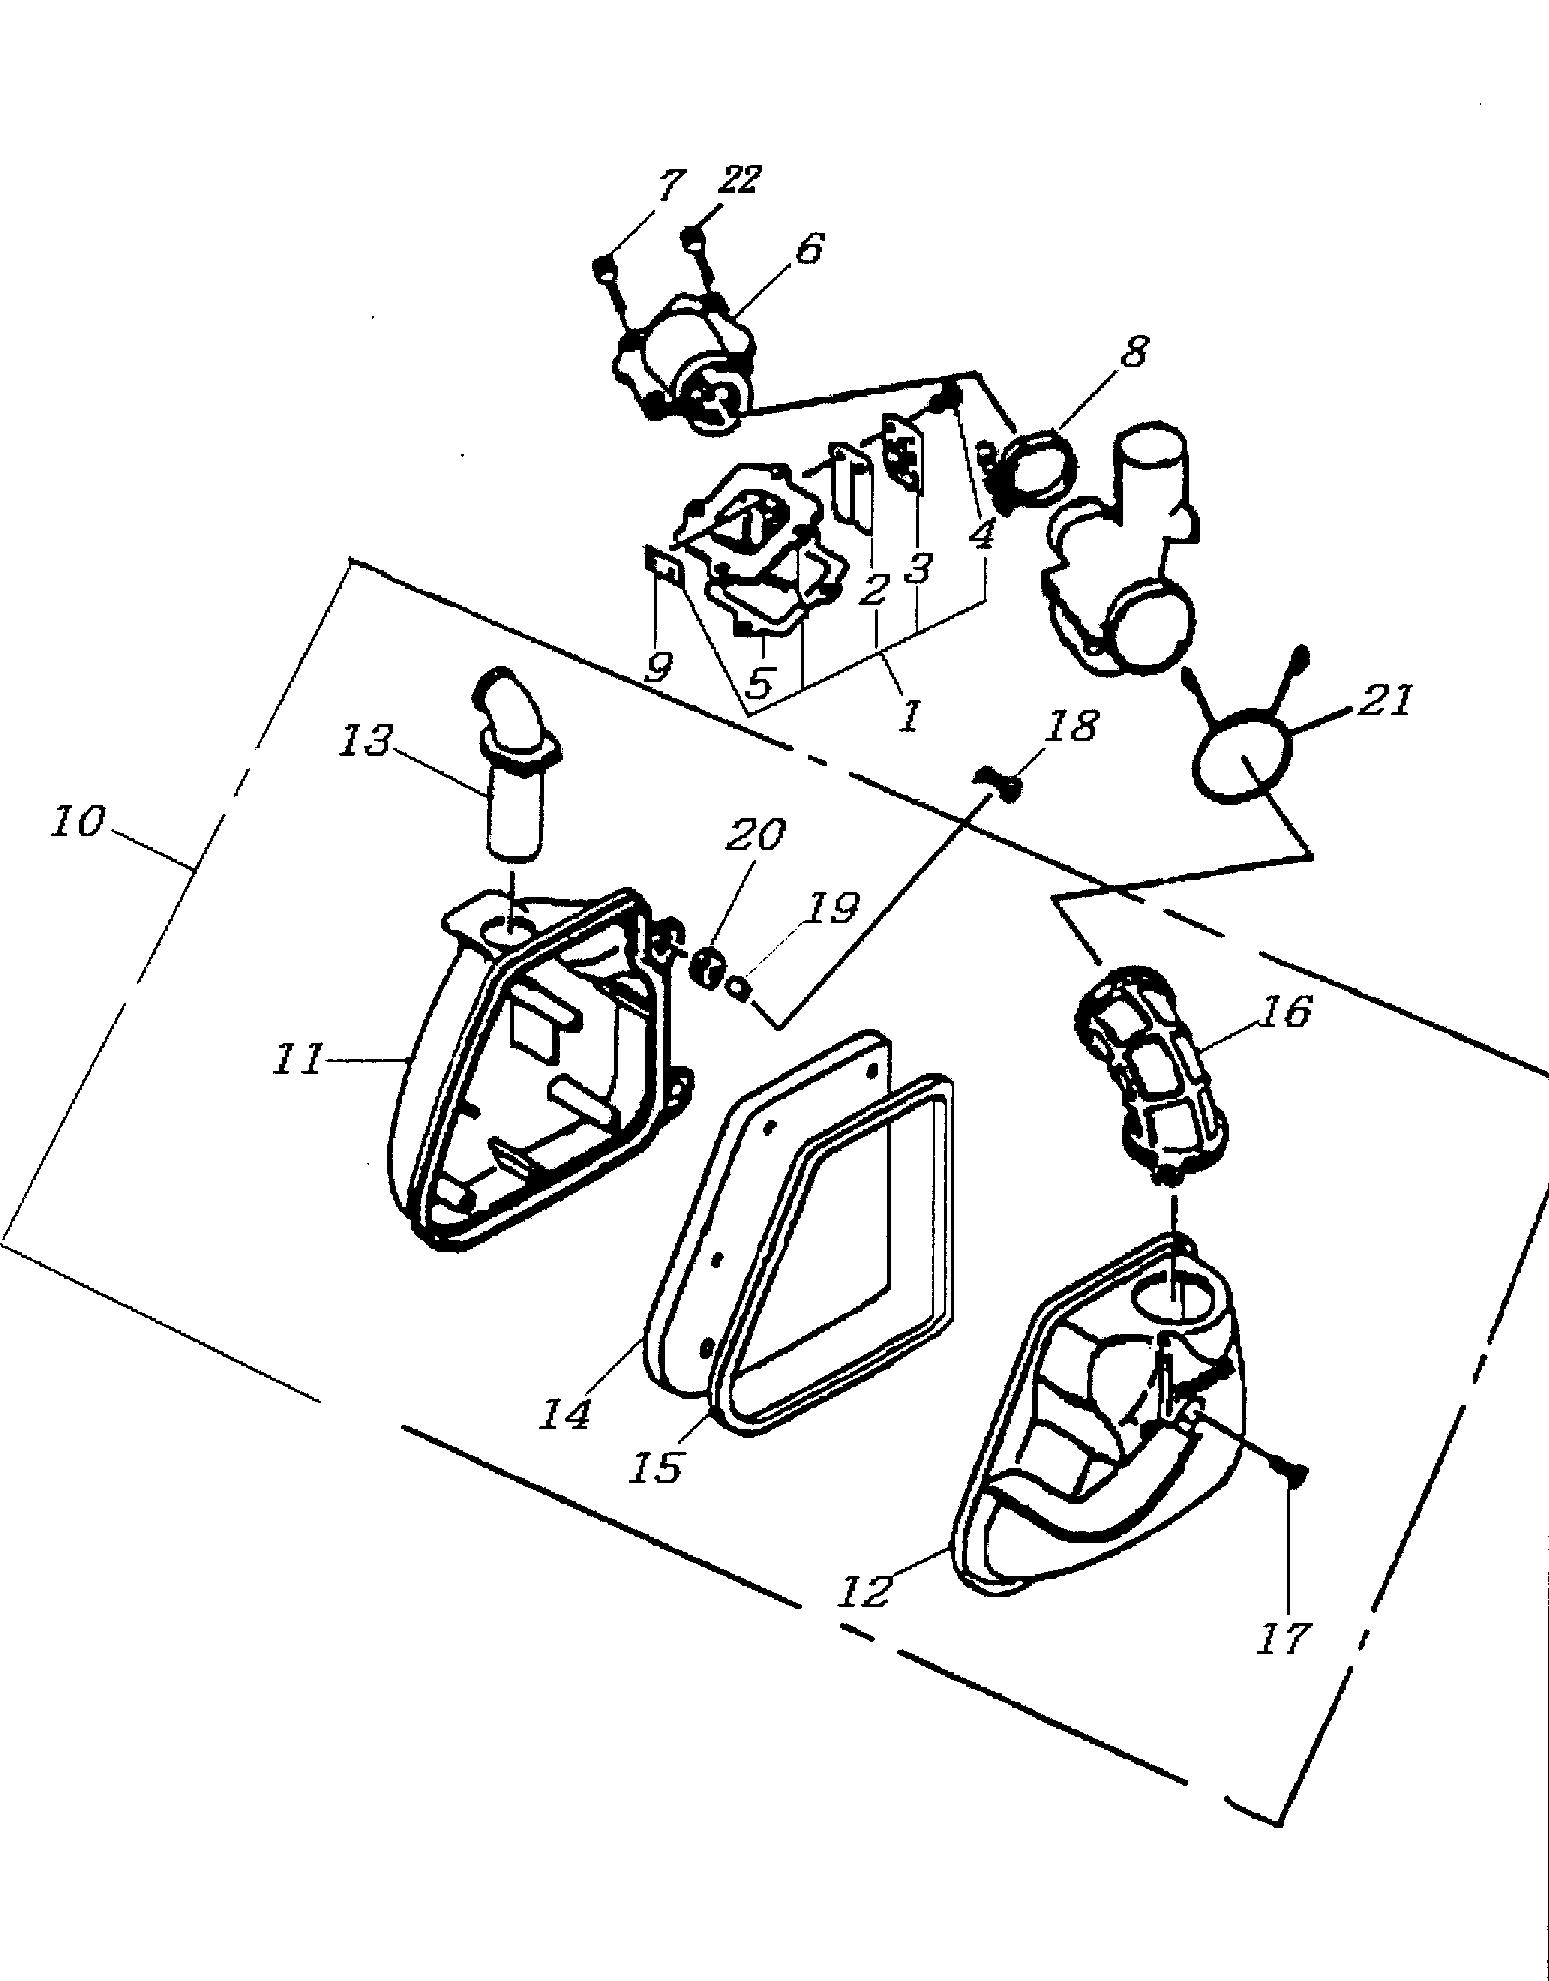 Einlasslamelle / Luftfilter